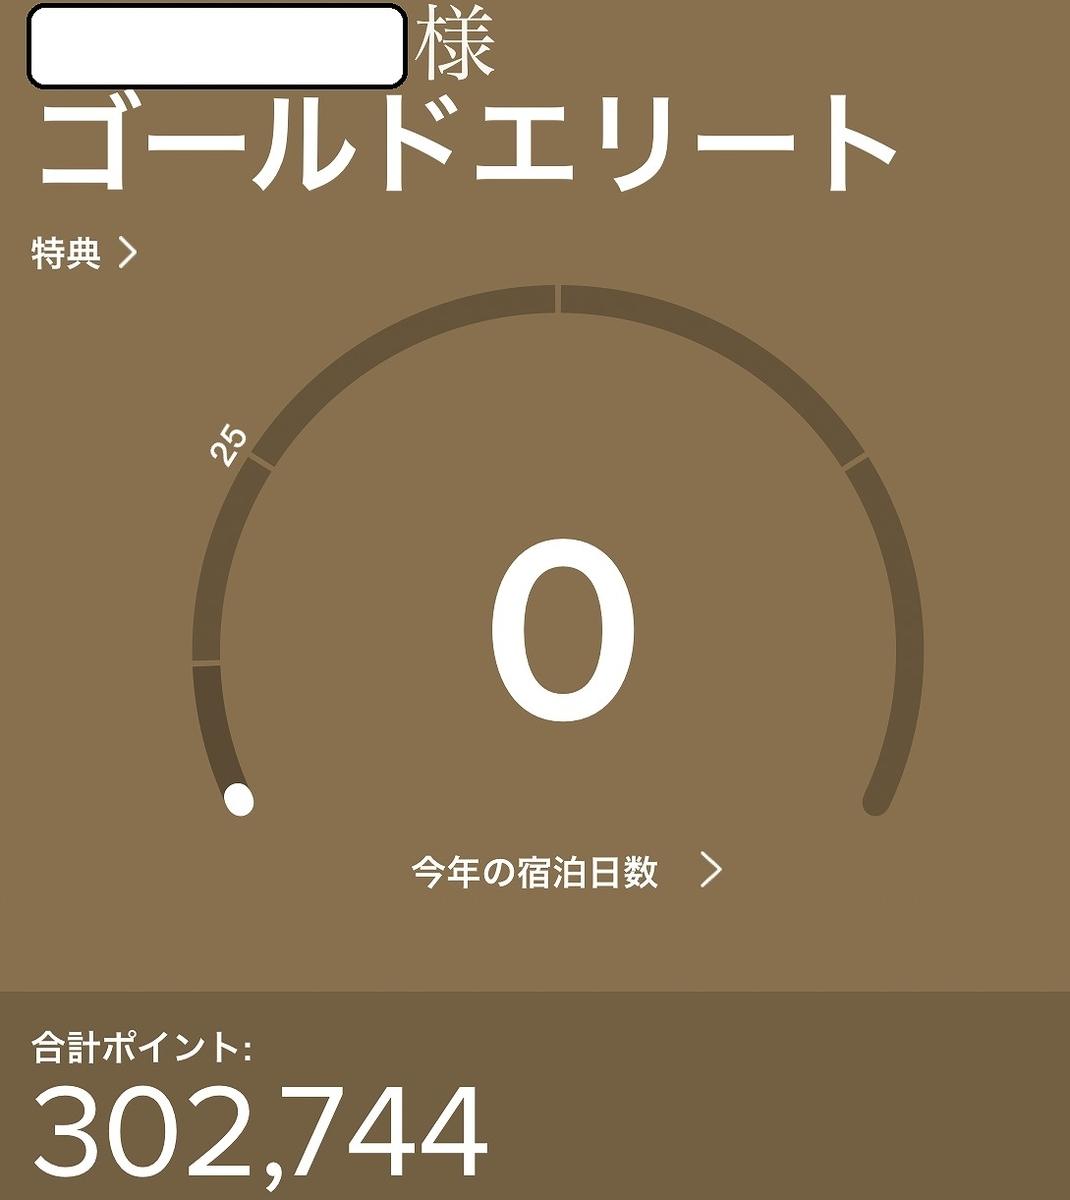 f:id:hirohito6001:20200315111341j:plain